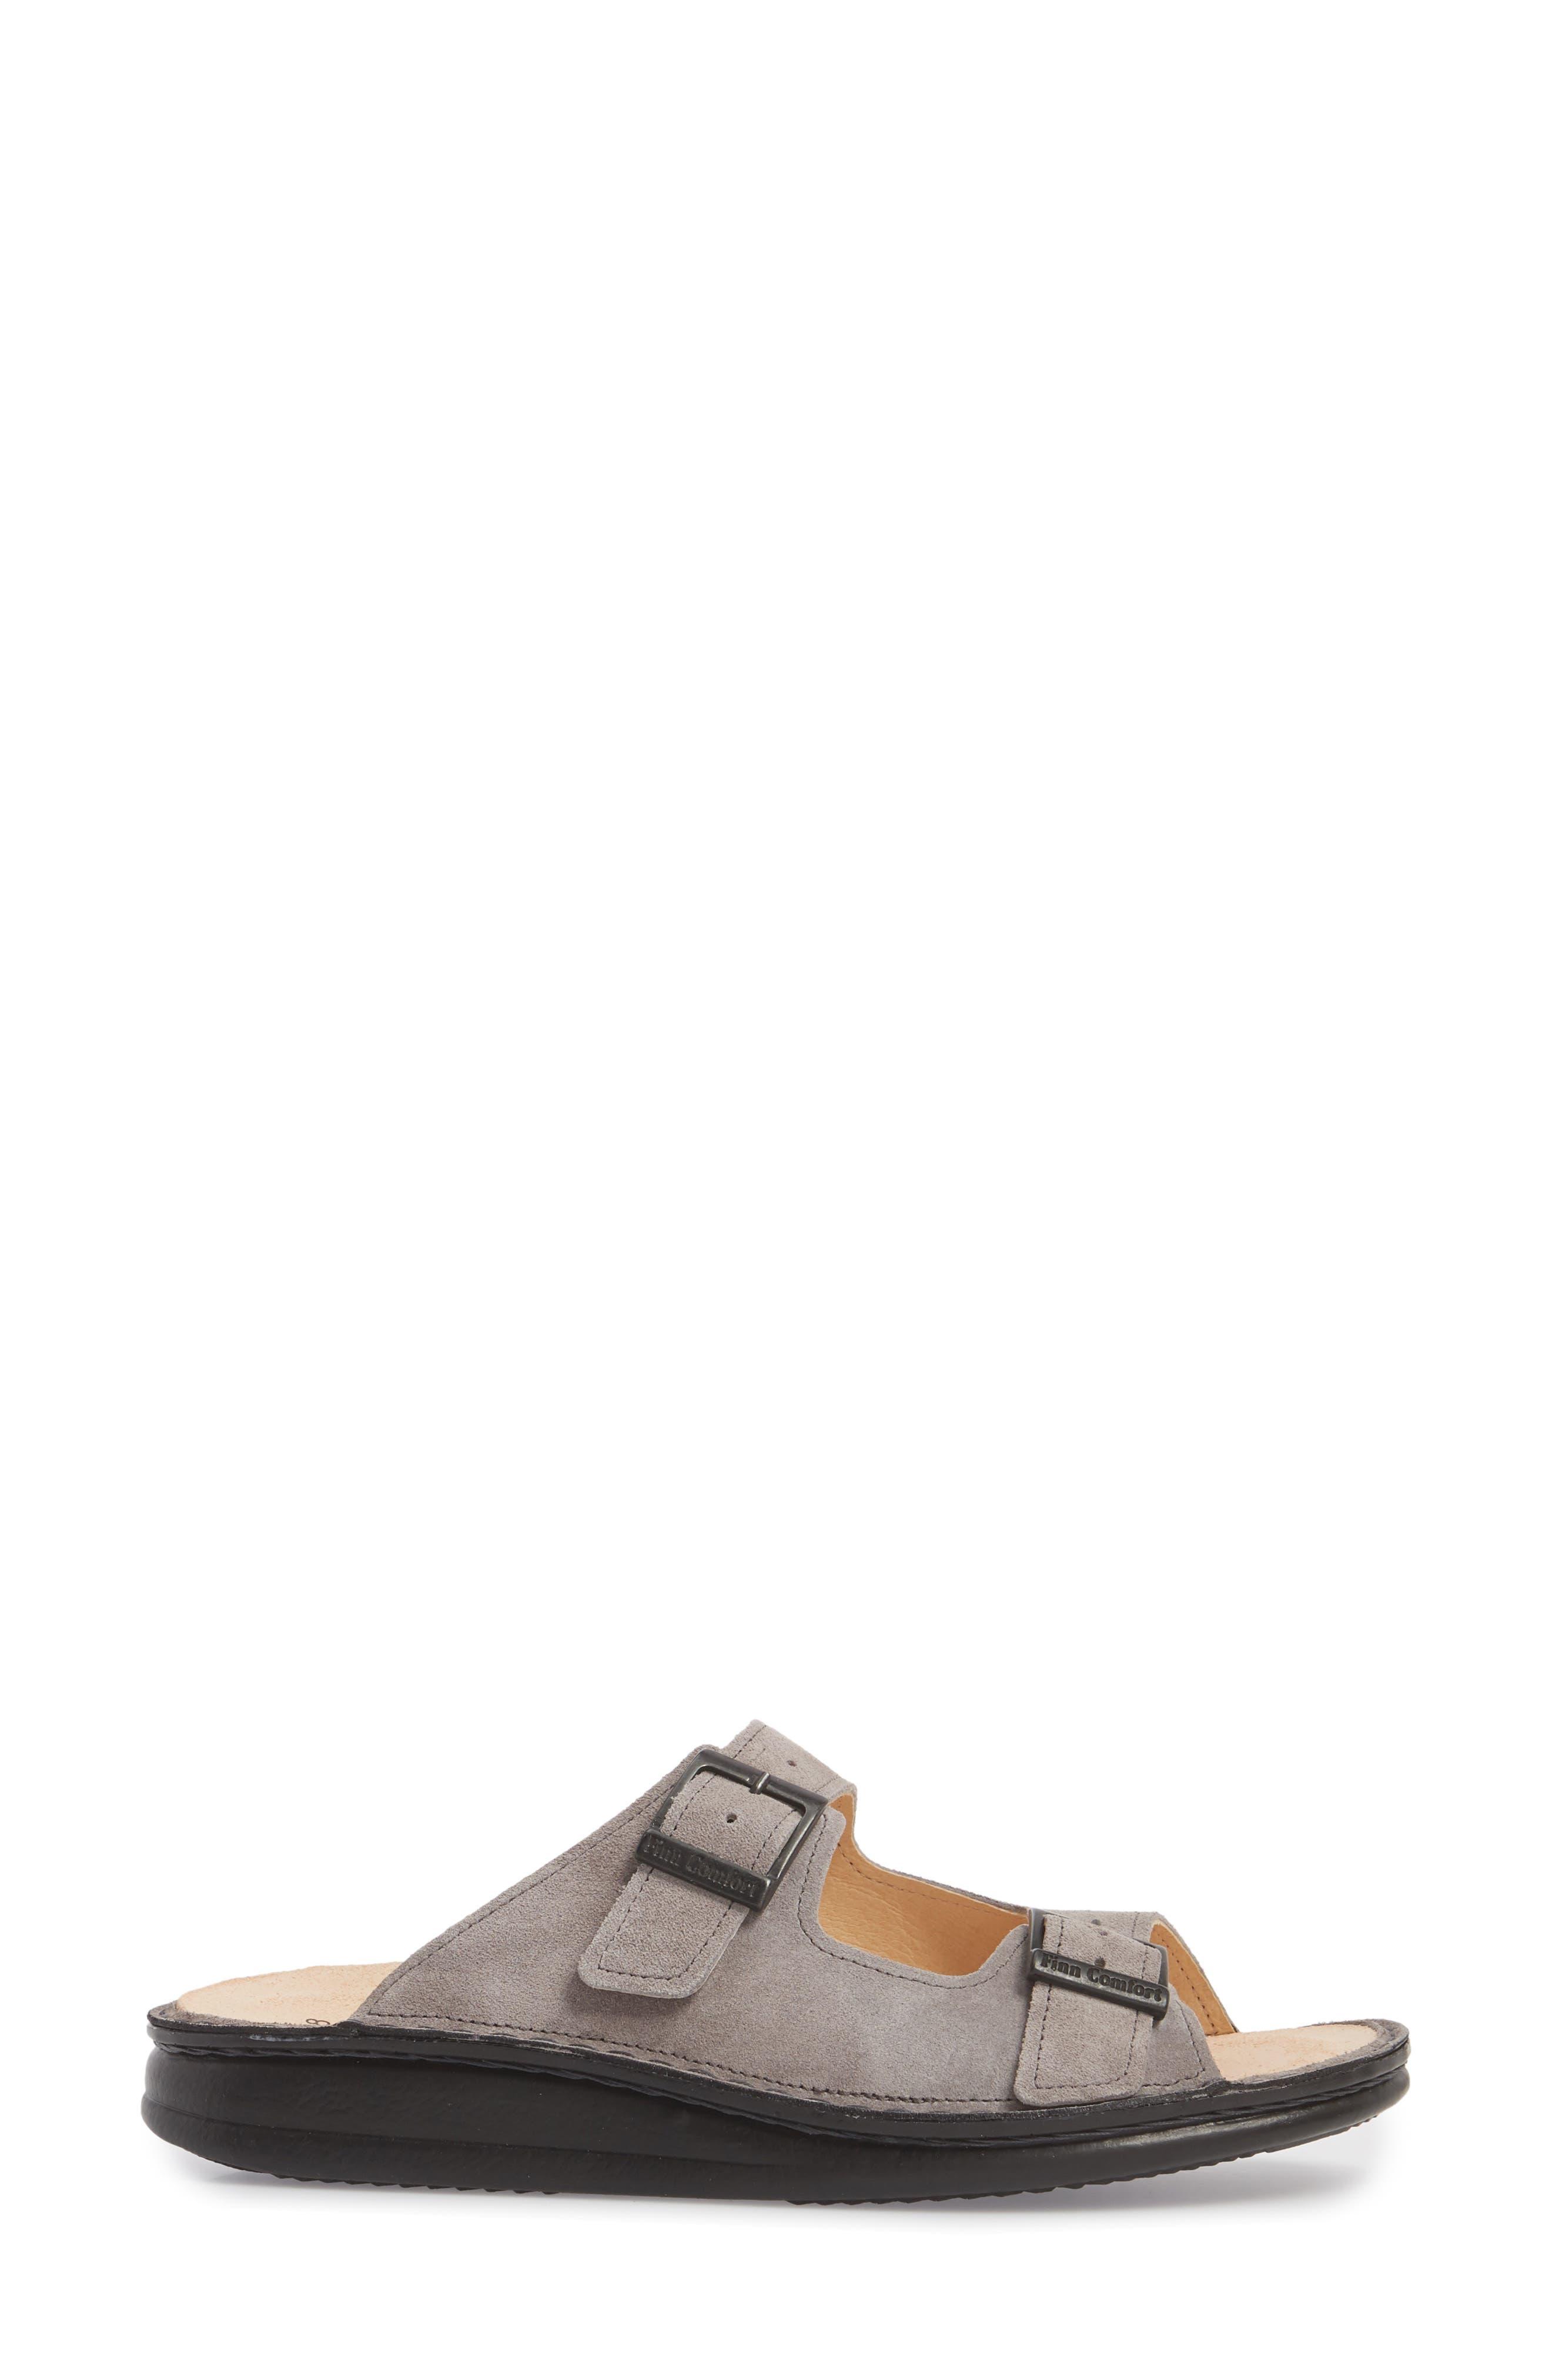 Hollister Slide Sandal,                             Alternate thumbnail 3, color,                             GINGER LEATHER